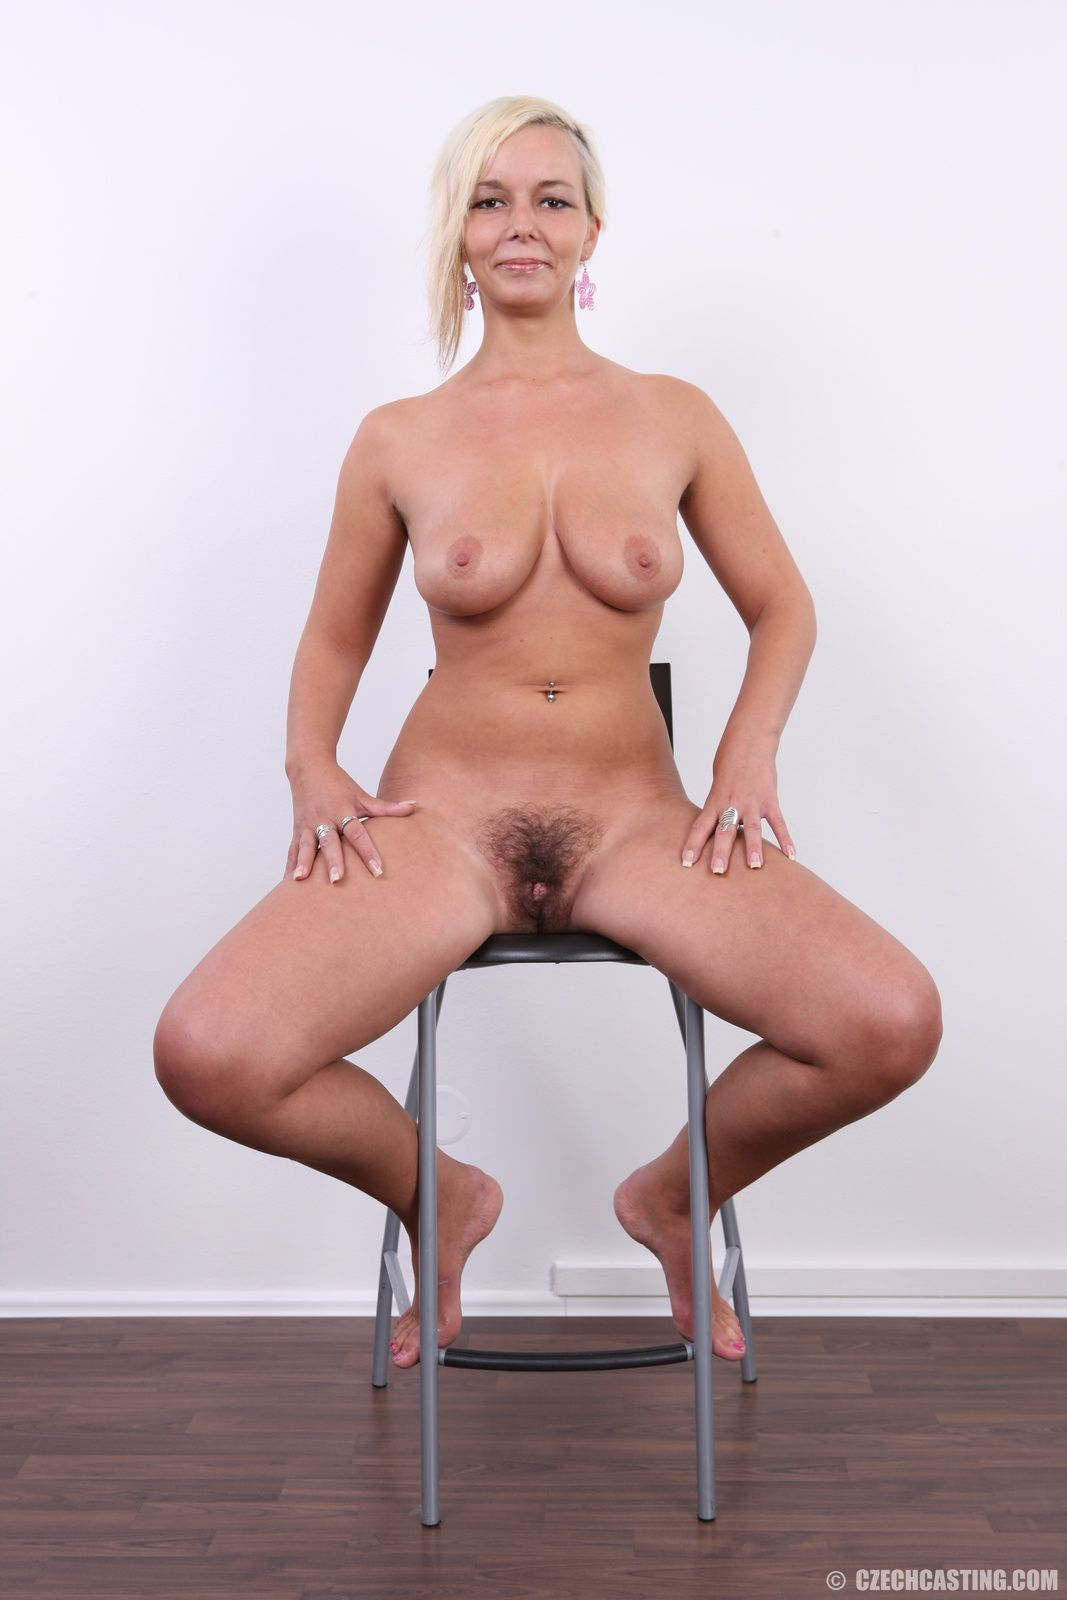 Casting hairy Girl -creampie